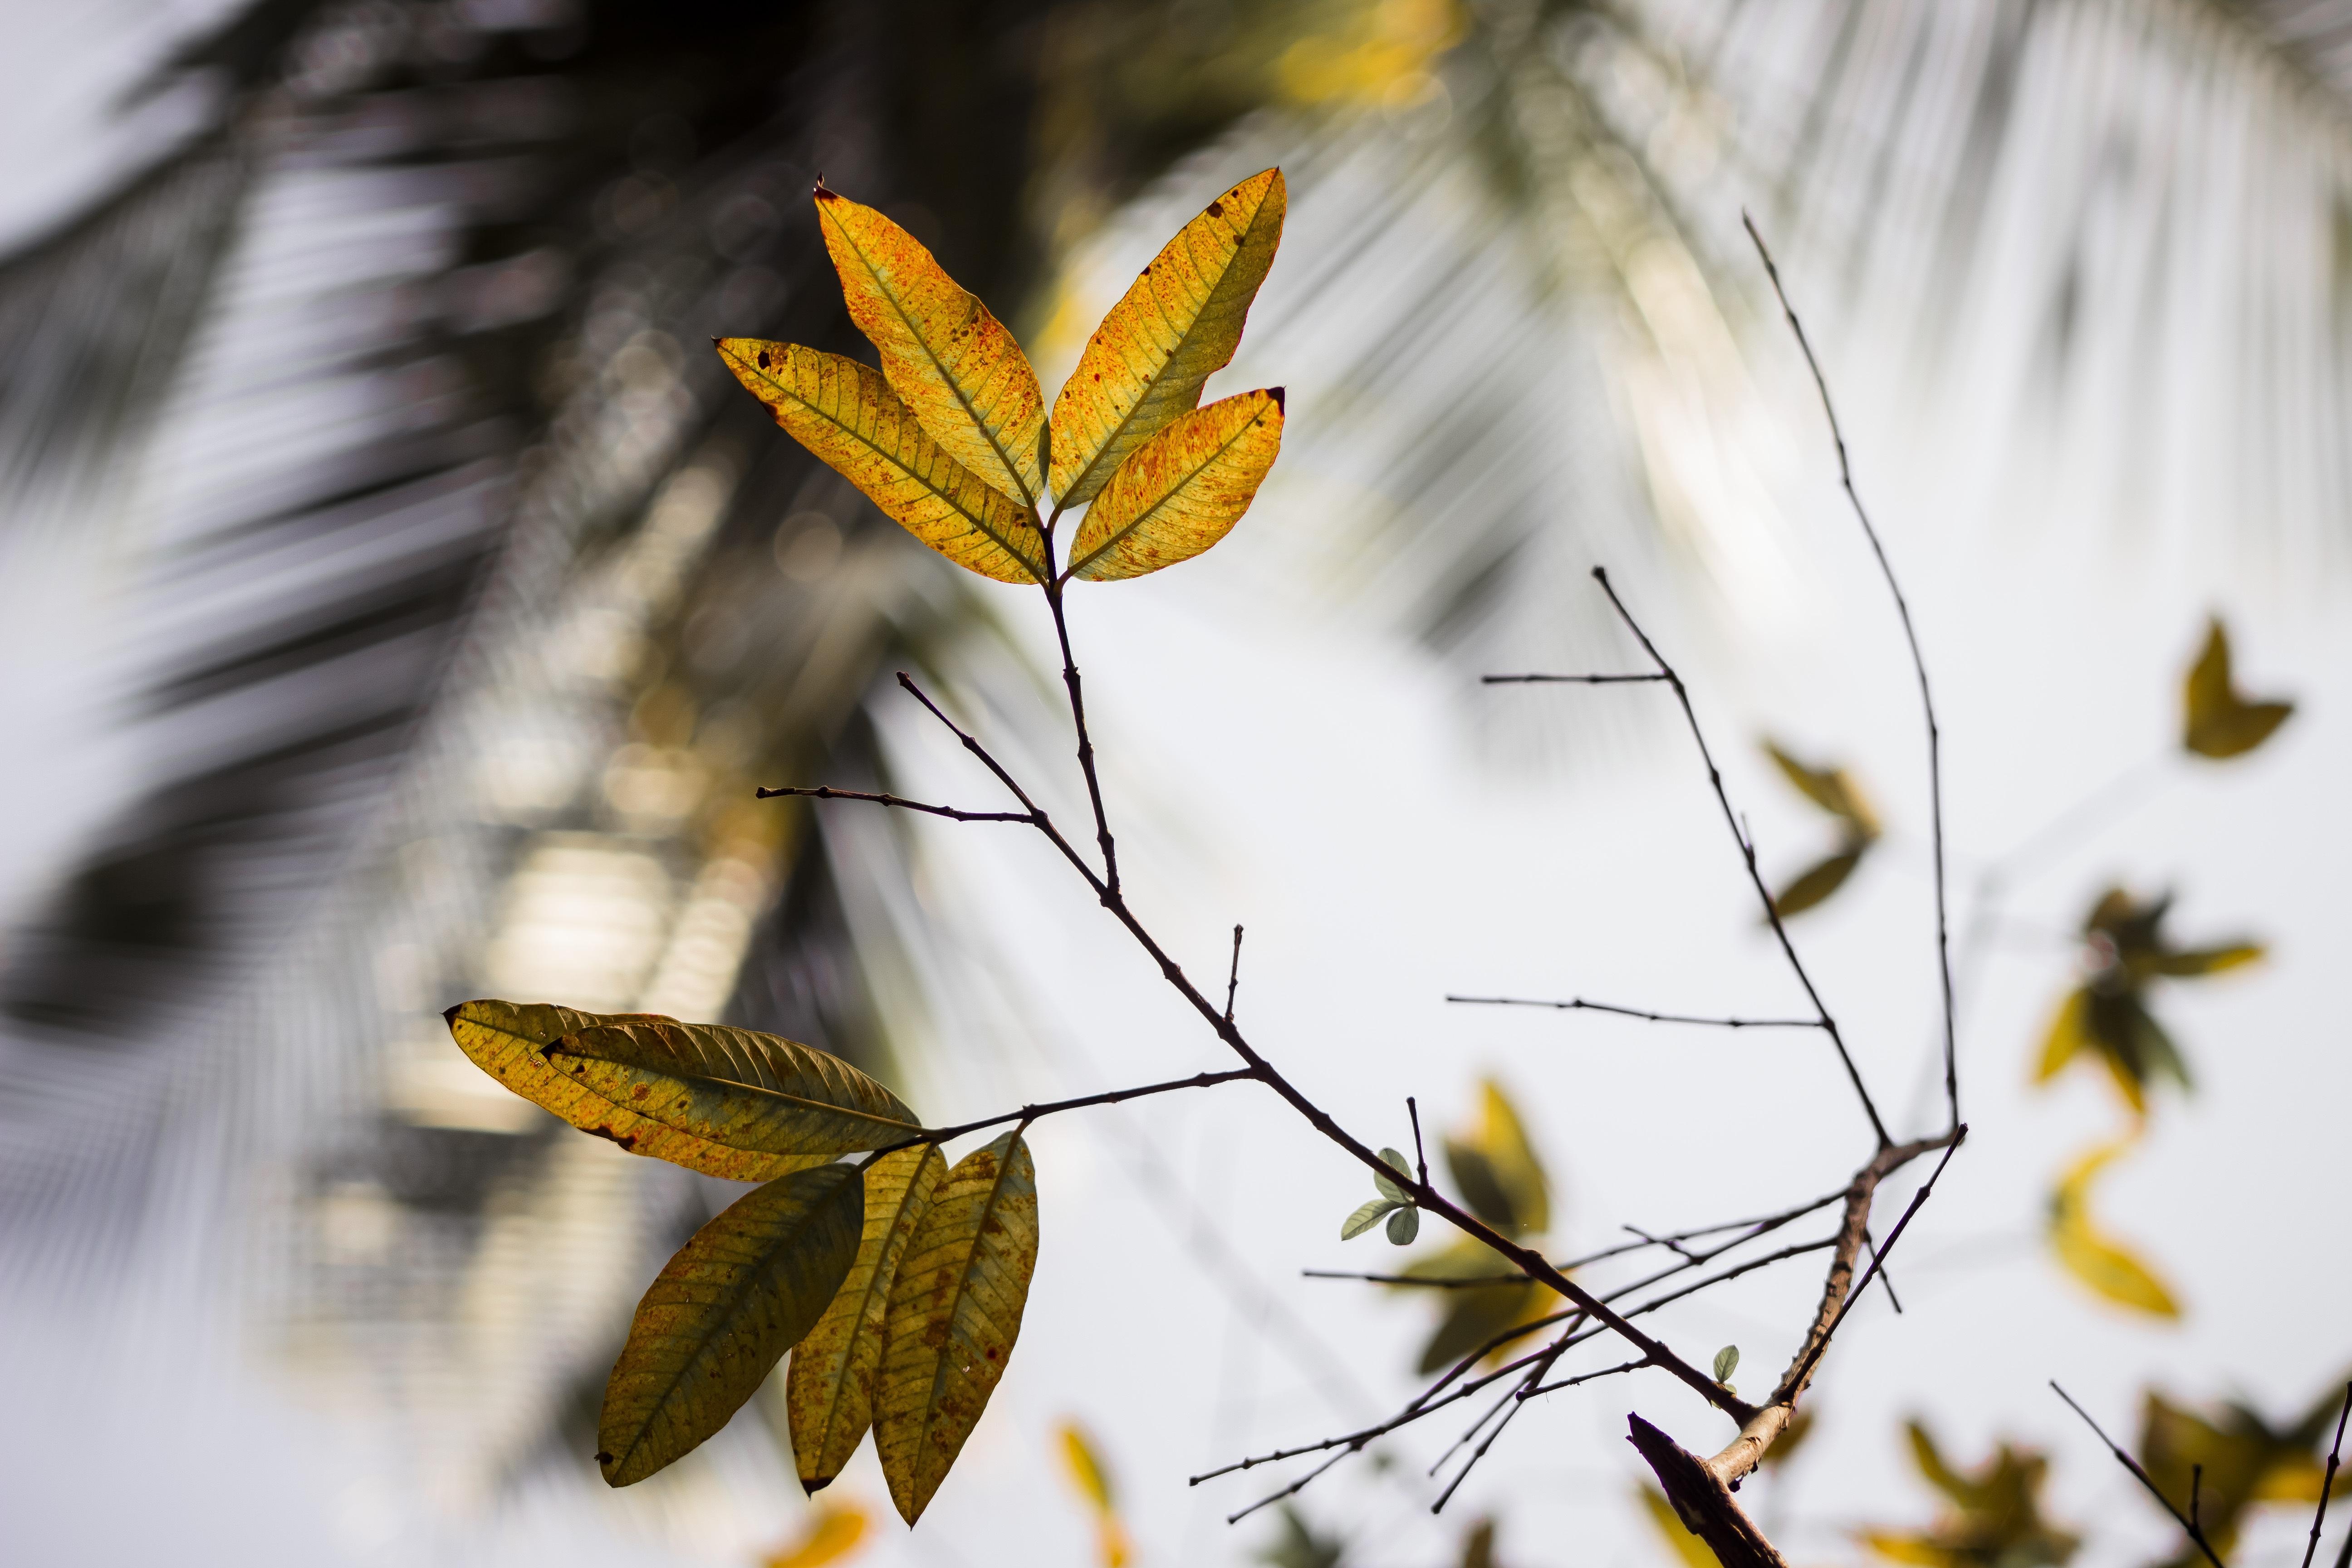 Baum Natur Ast Winter scharf Pflanze Sonnenlicht Morgen Blatt Blume Frost Frühling Grün Herbst Botanik Gelb